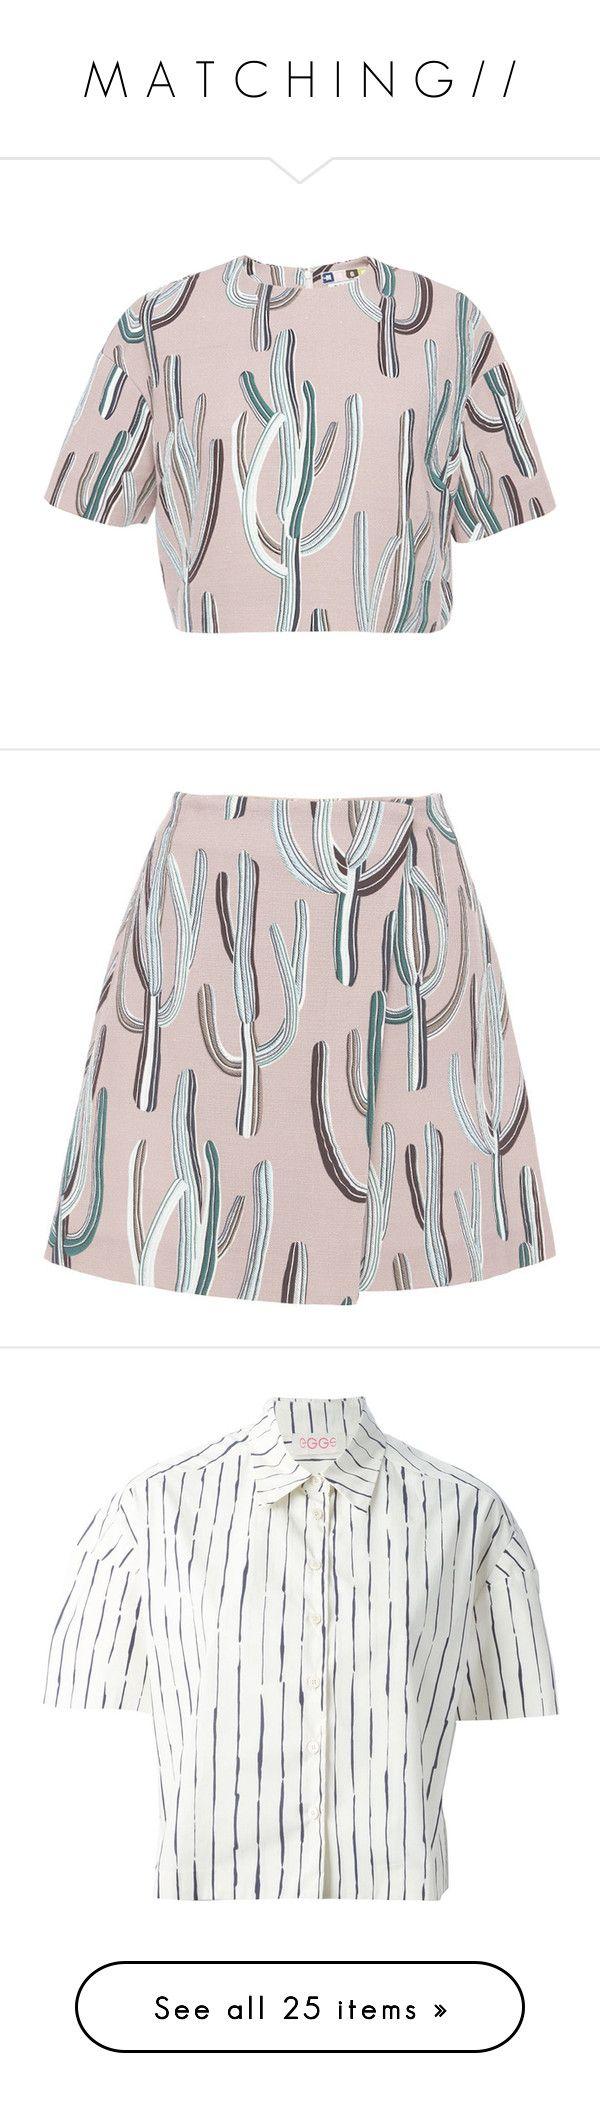 """M A T C H I N G / /"" by queen-laureen ❤ liked on Polyvore featuring tops, crop top, shirts, pink multi, short sleeve crop top, pink shirts, cactus print shirt, cropped tops, cotton shirts and skirts"